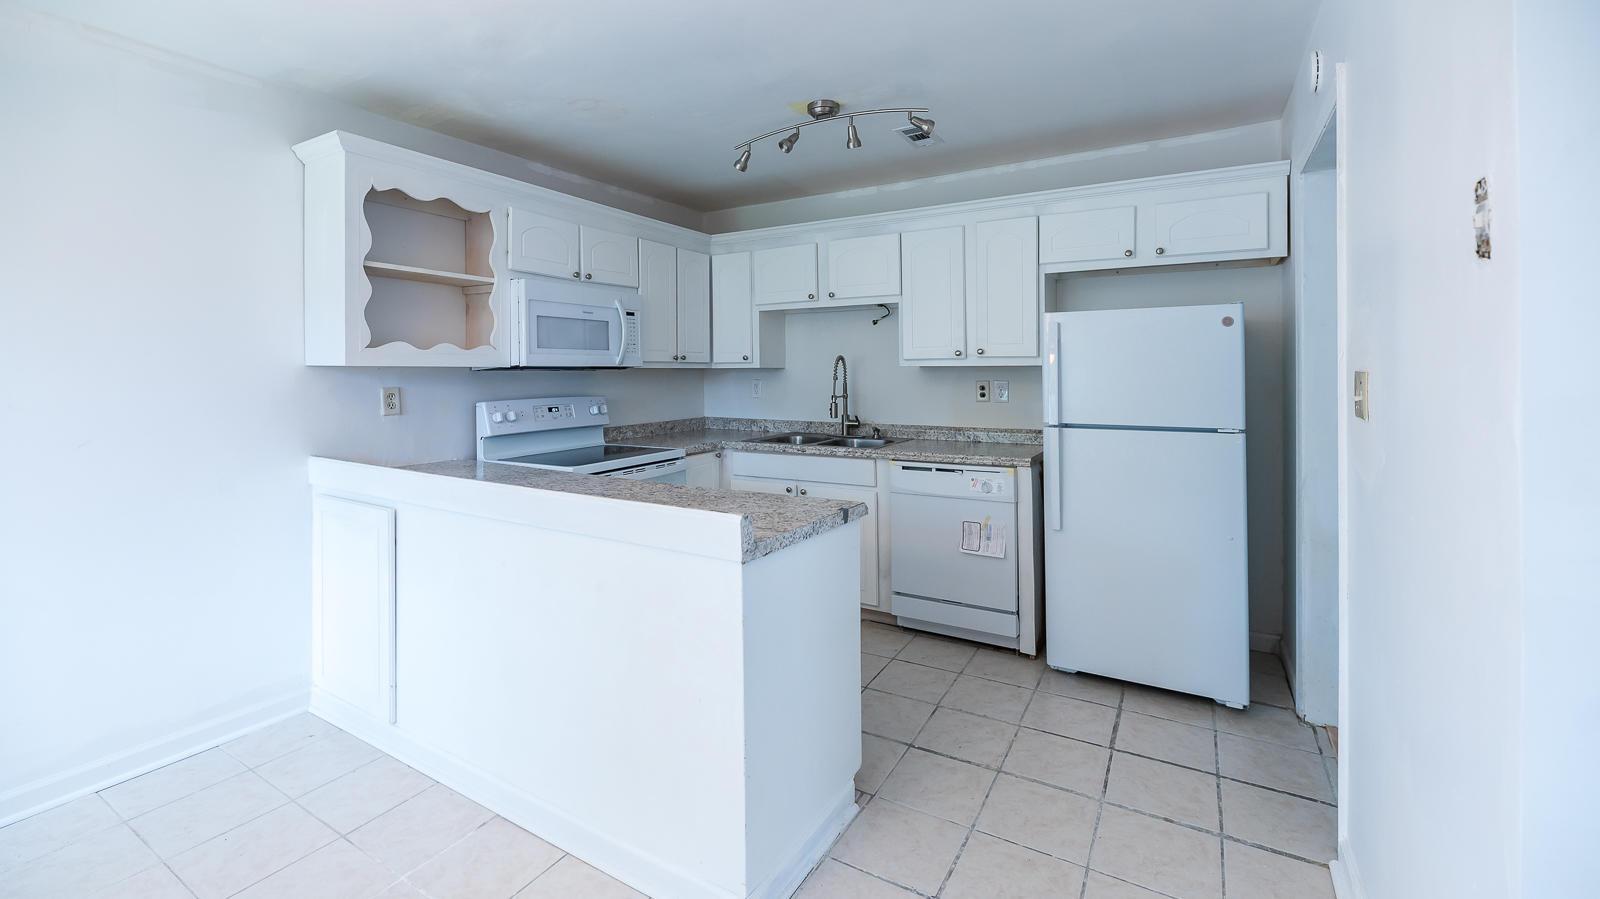 Ashley Villas Homes For Sale - 4315 Briarstone, North Charleston, SC - 22